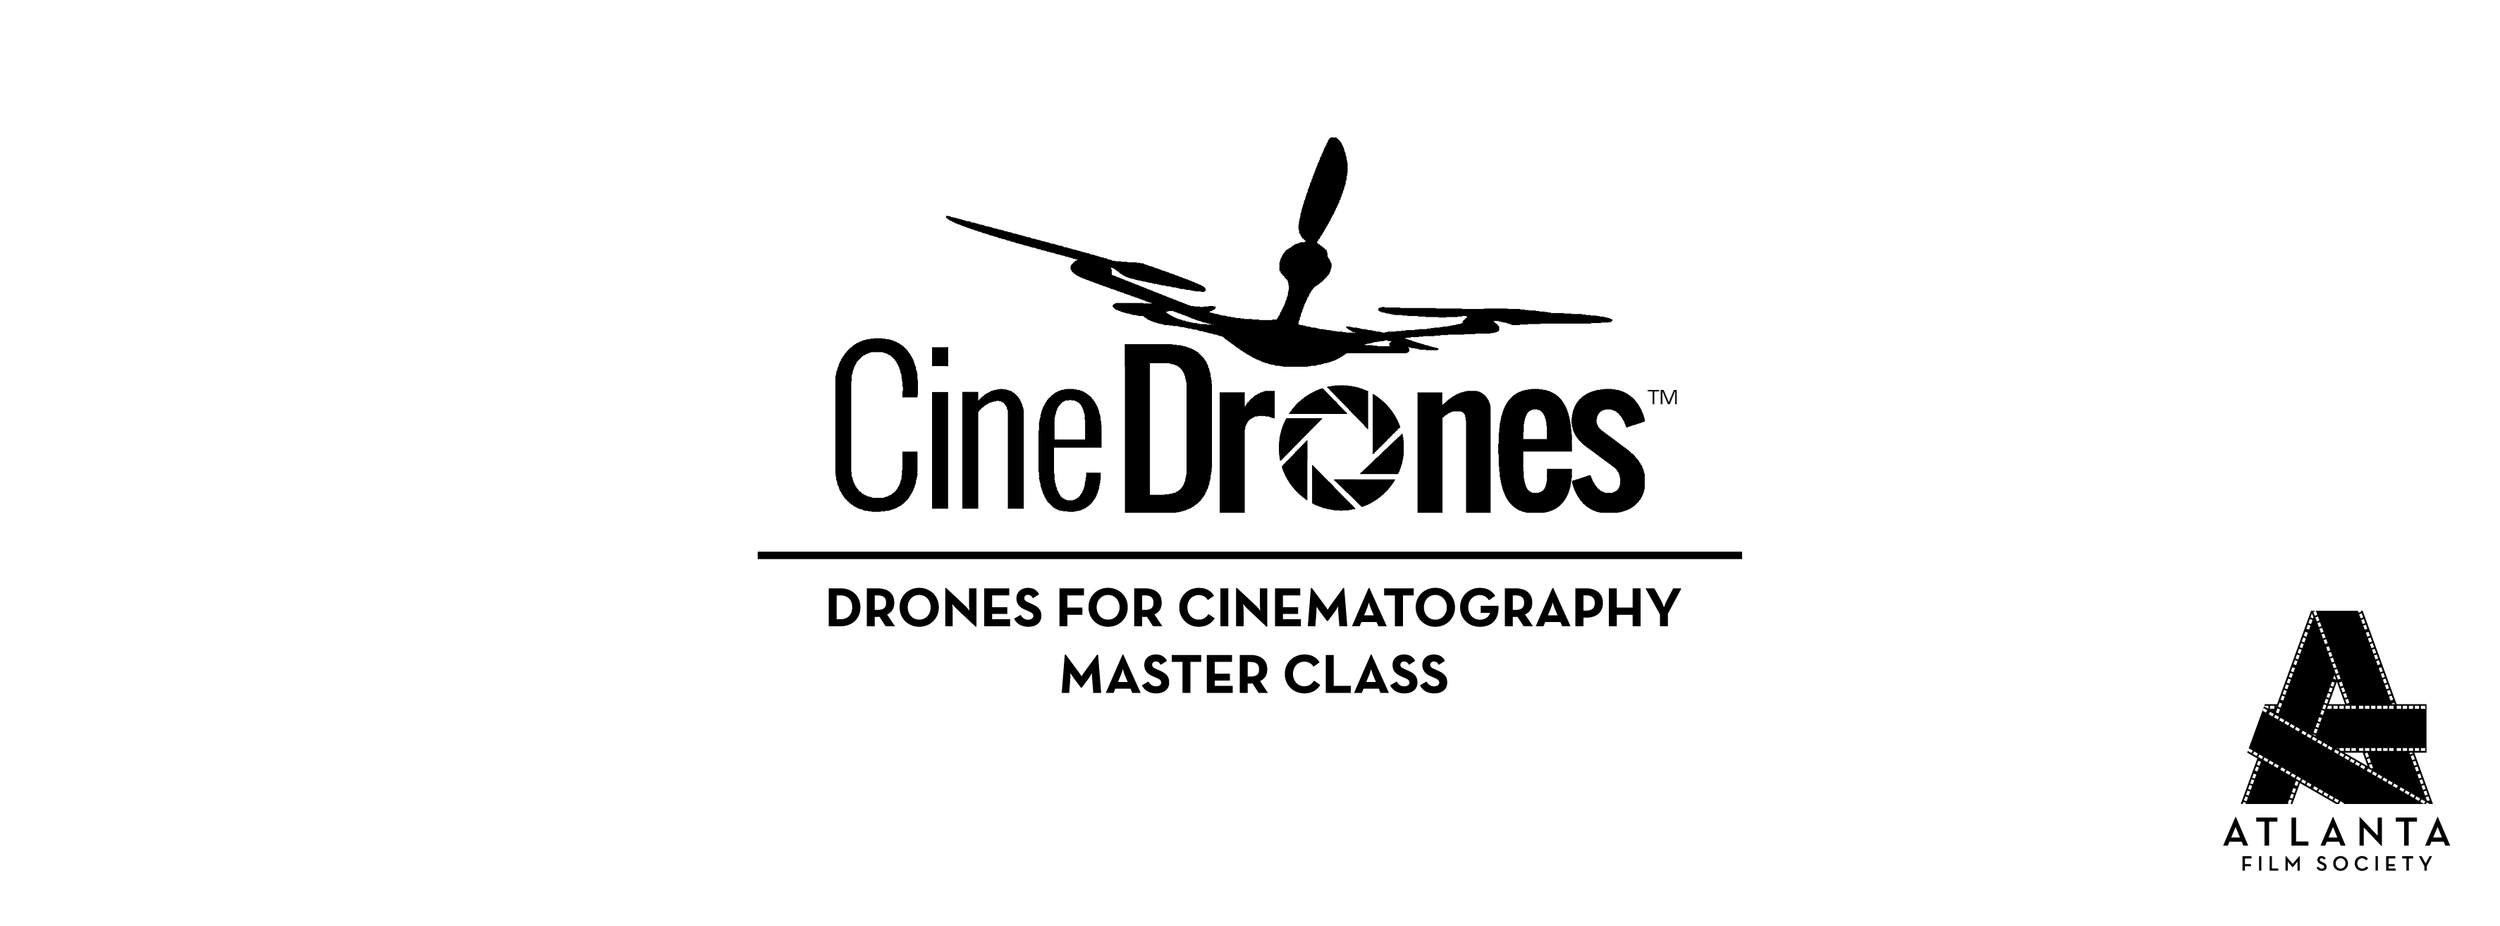 ATLFS-CineDrone_Masterclass.png